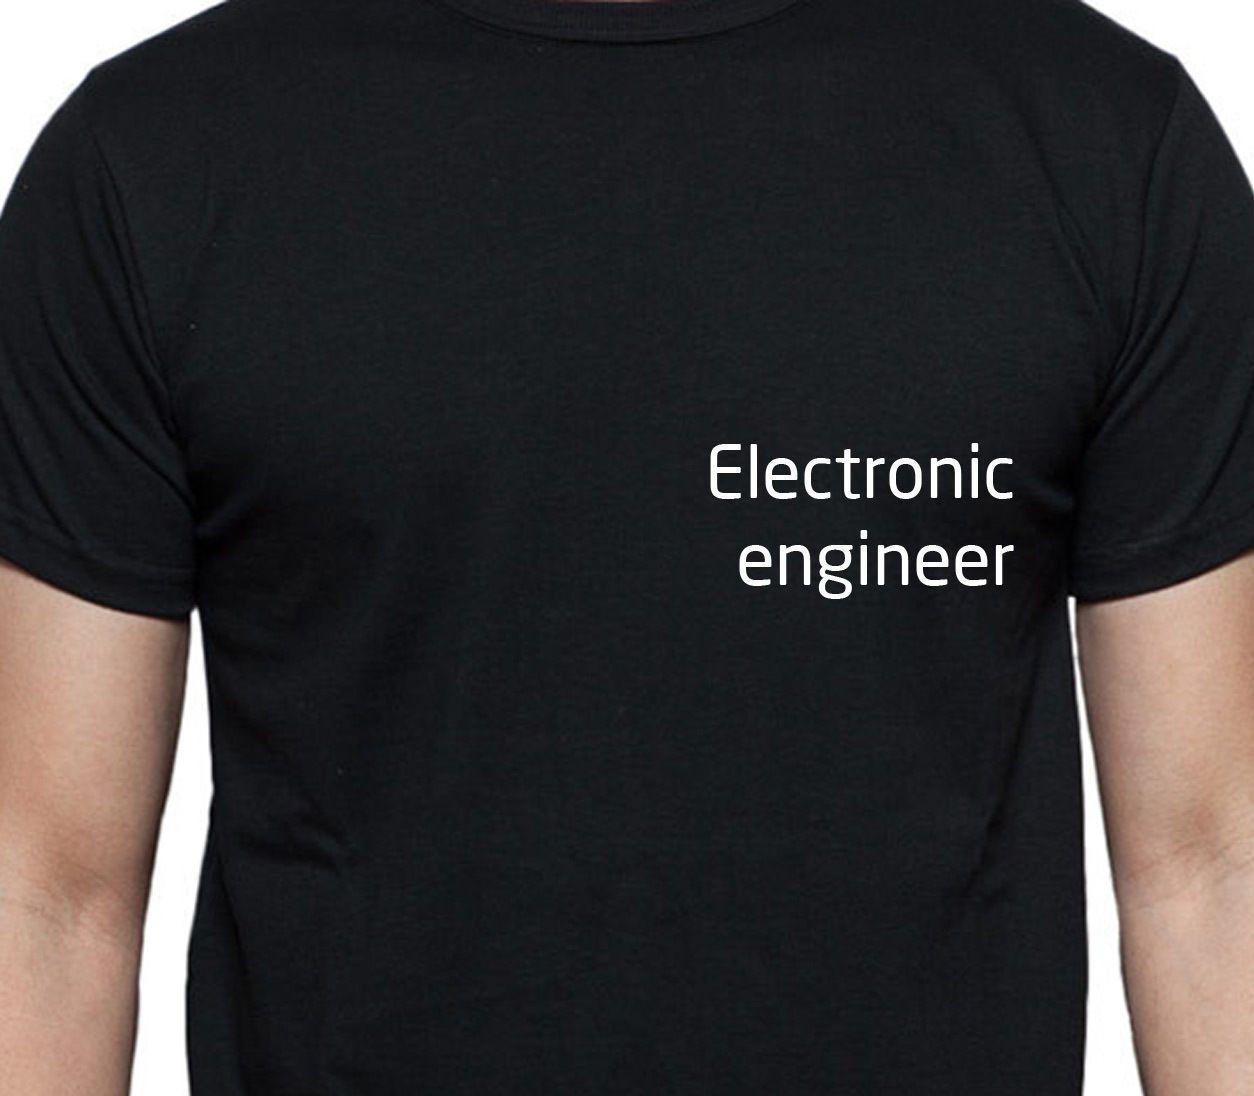 e26e1ee2 ELECTRONIC ENGINEER T SHIRT PERSONALISED TEE JOB WORK SHIRT CUSTOM Shirt  Shirts Buy Tees From Young_ten, $12.96| DHgate.Com